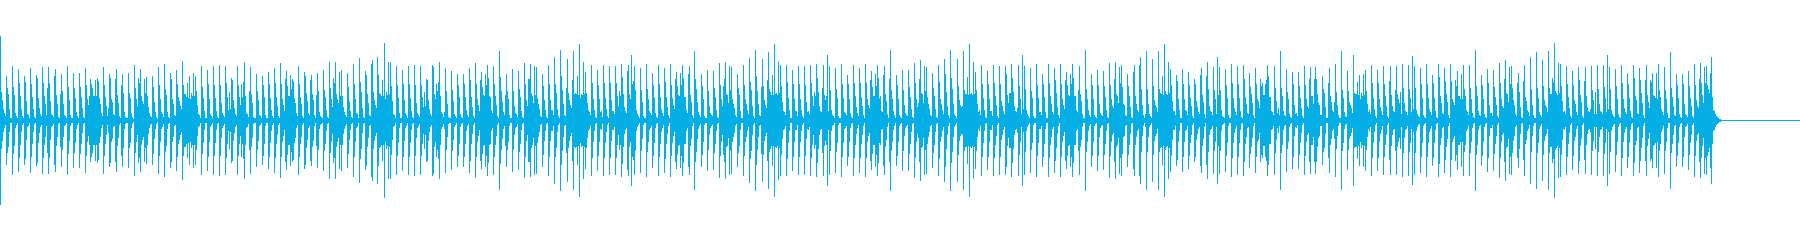 Dr&Bassクラブ・バー風のJAZZの再生済みの波形